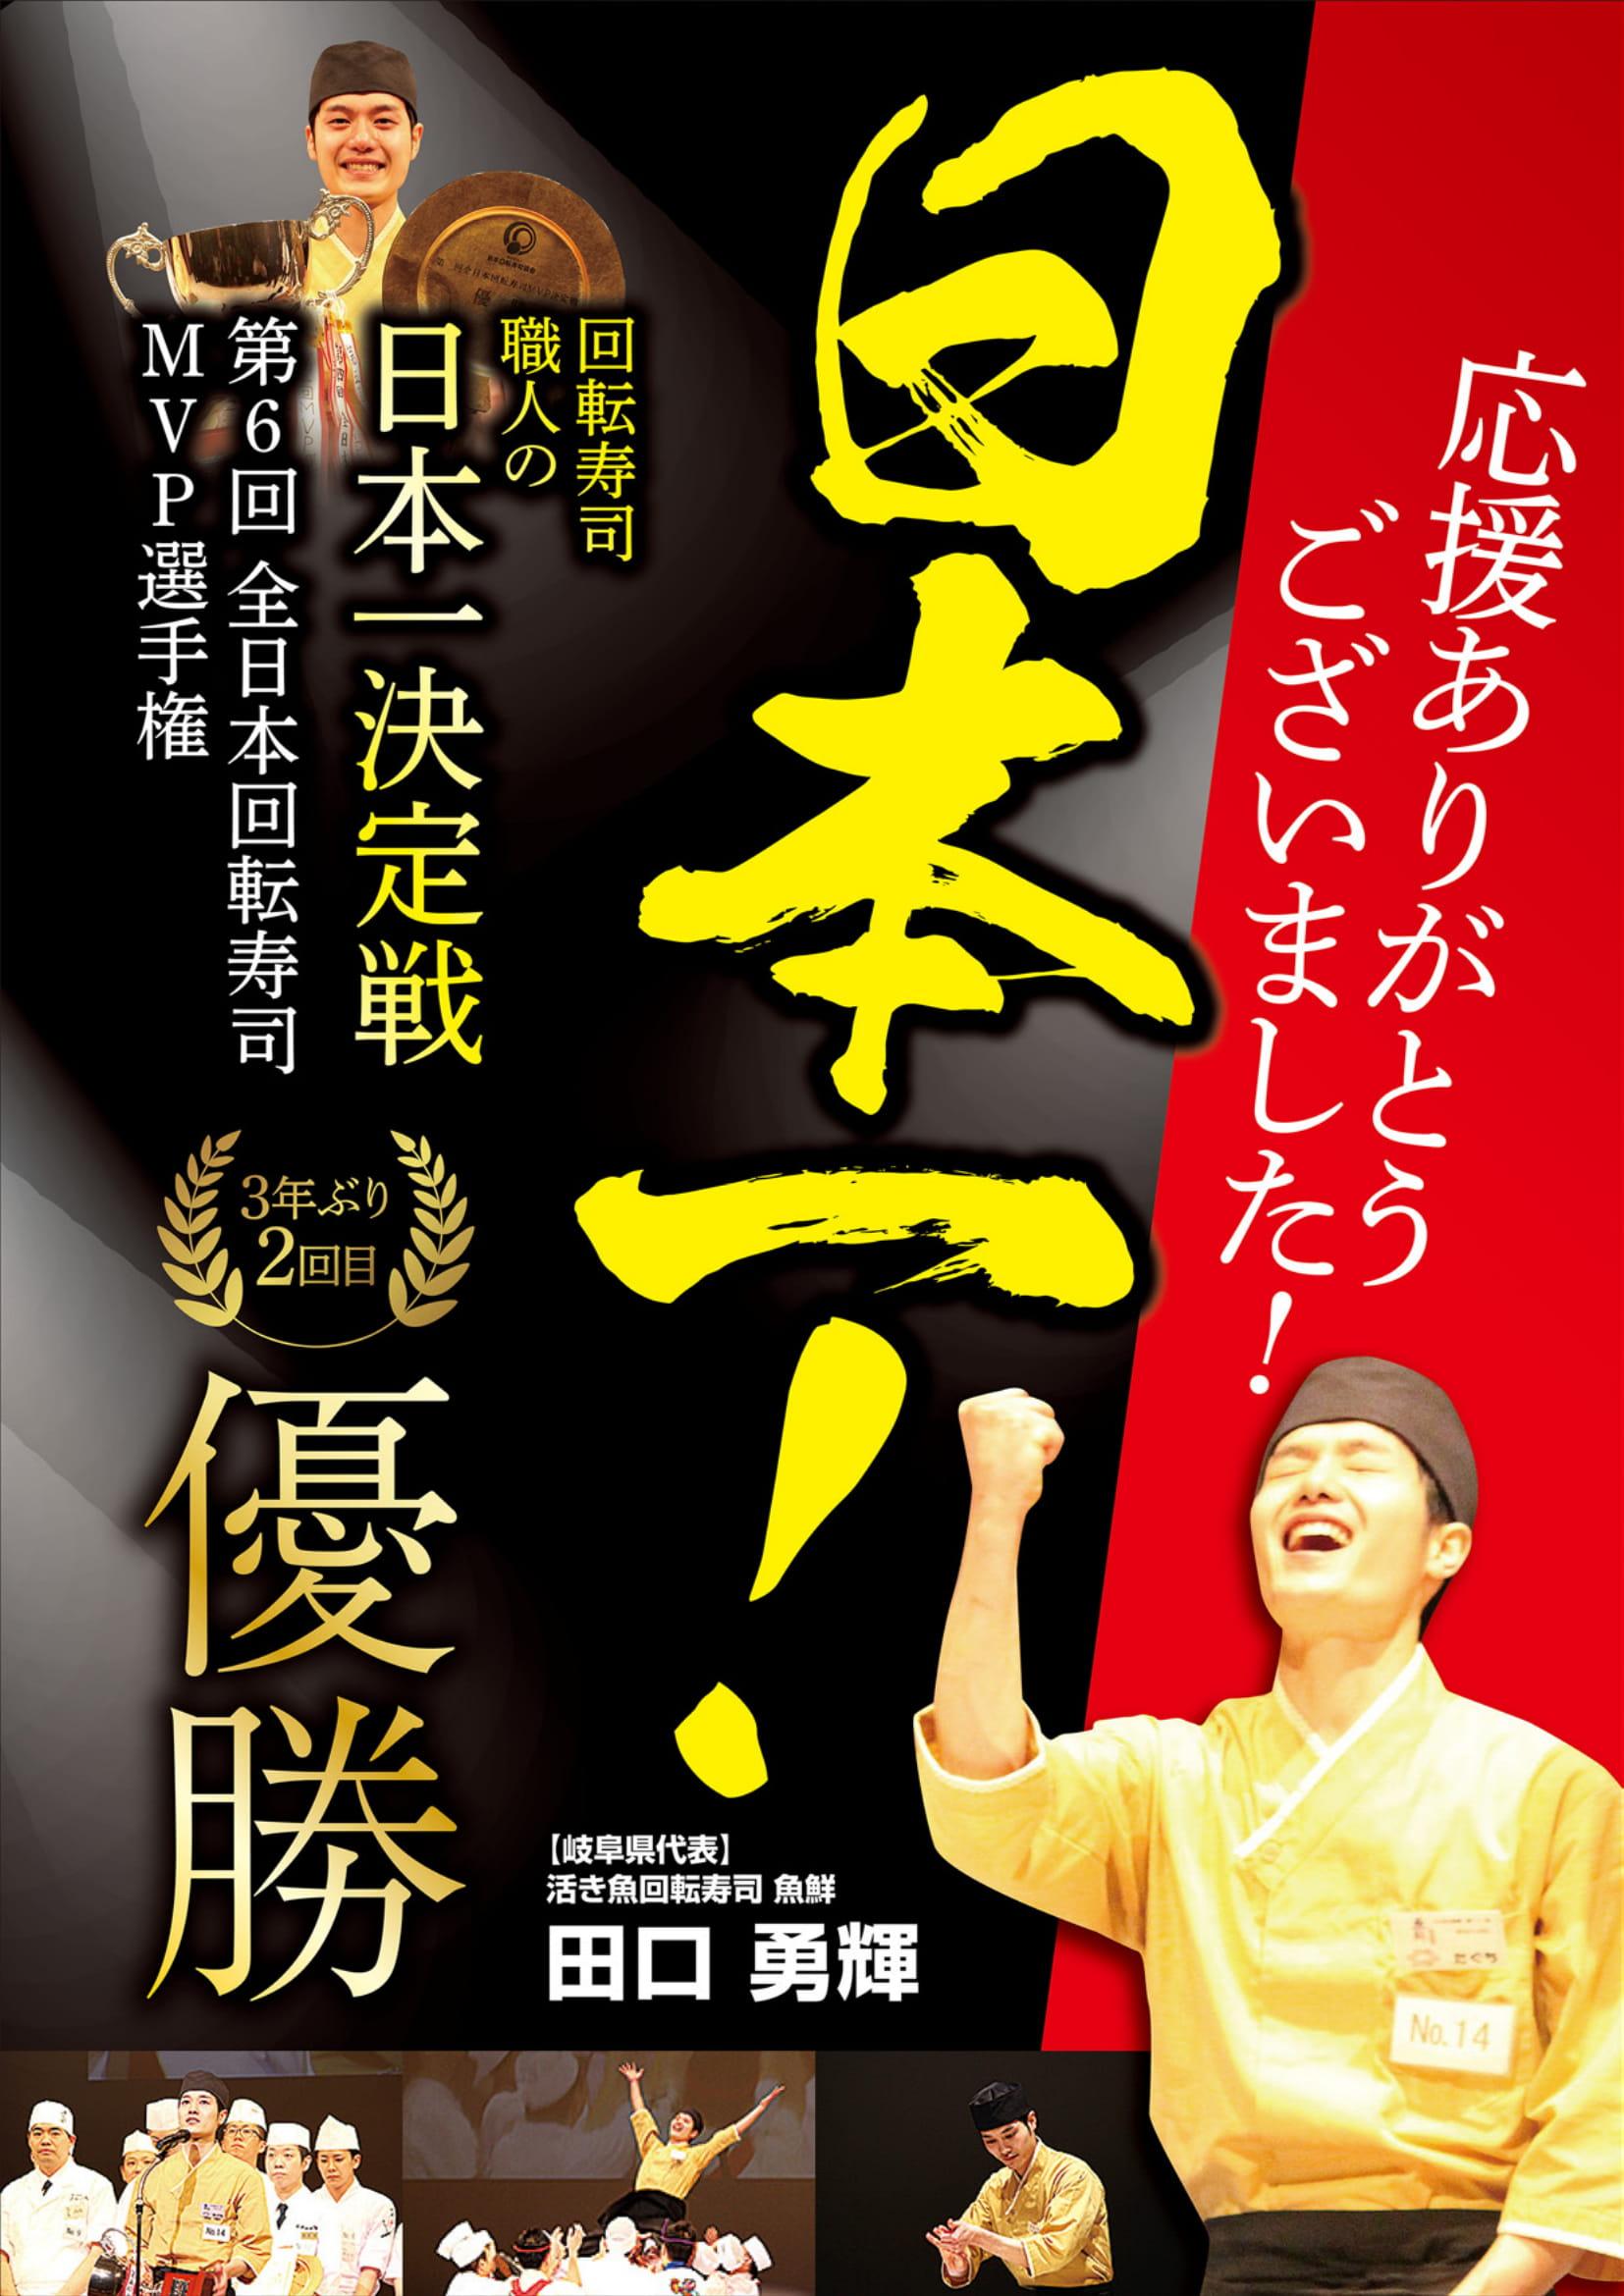 全日本回転寿司マイスターMVP決定戦優勝